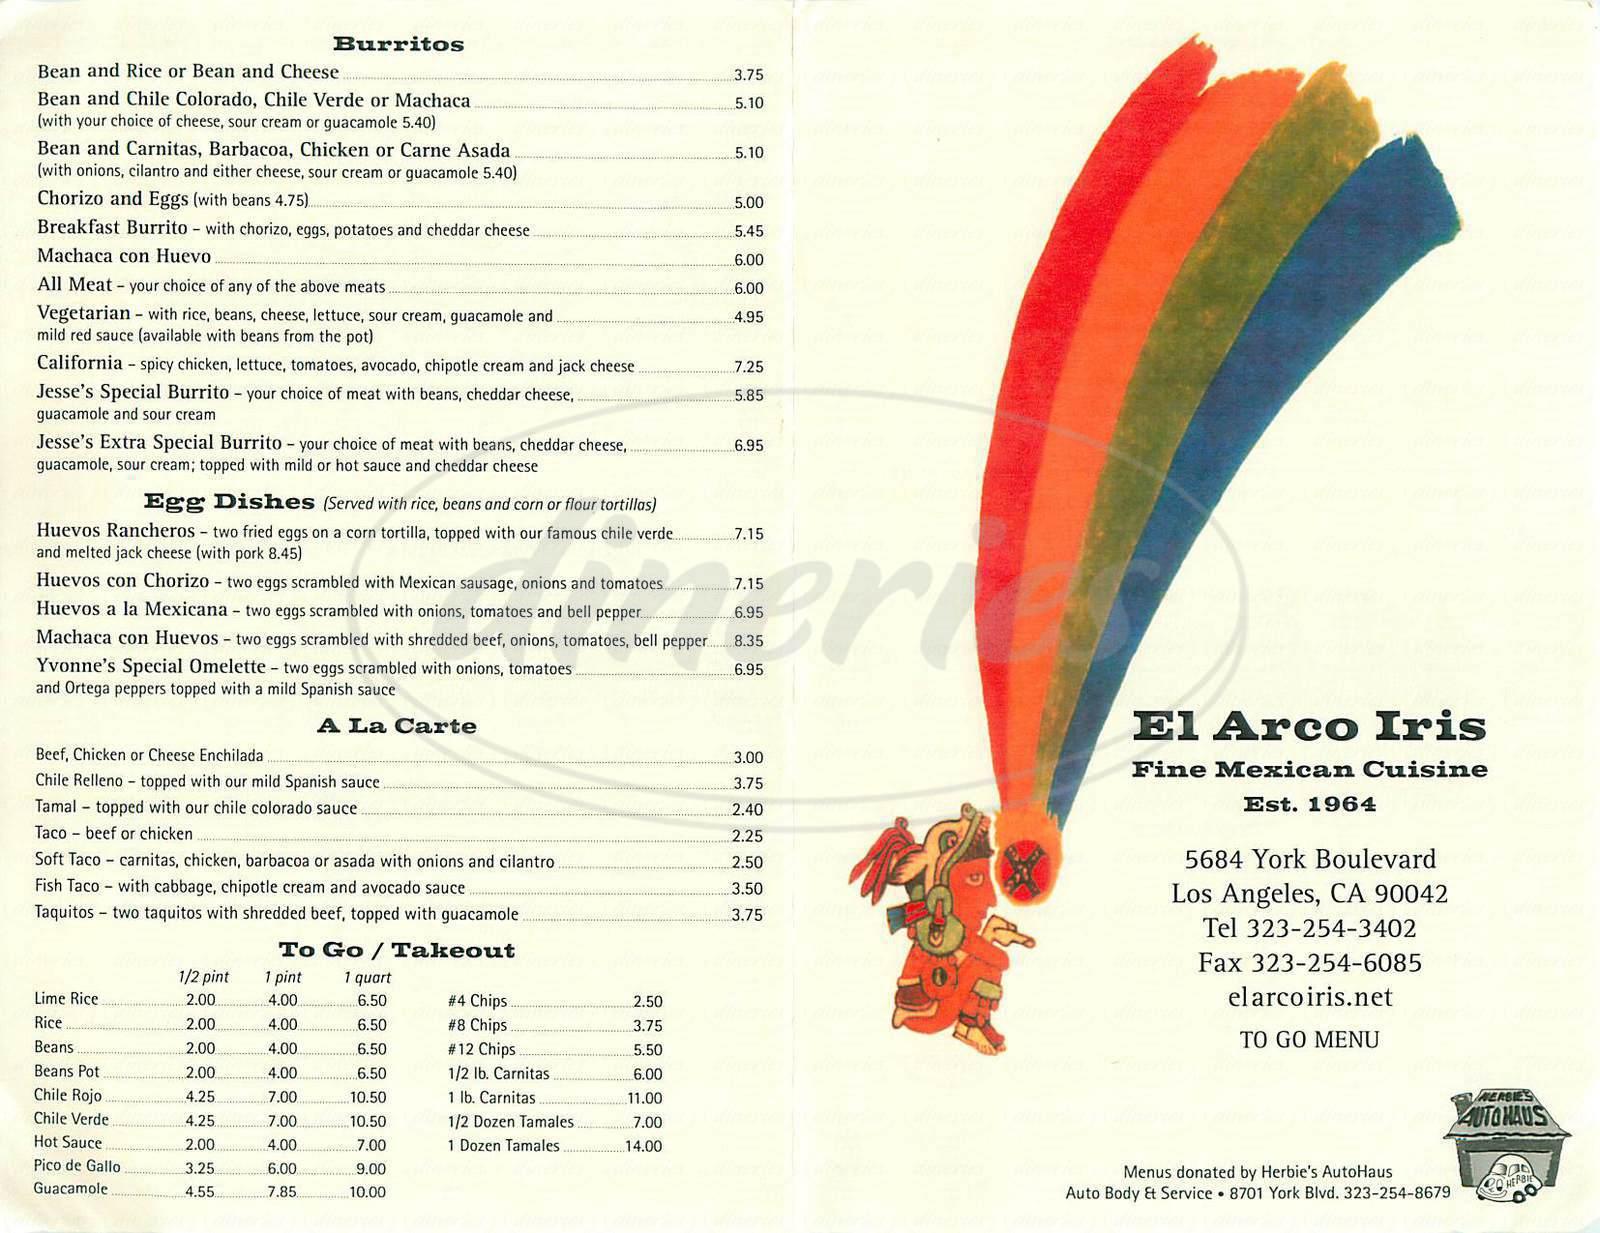 menu for El Arco Iris